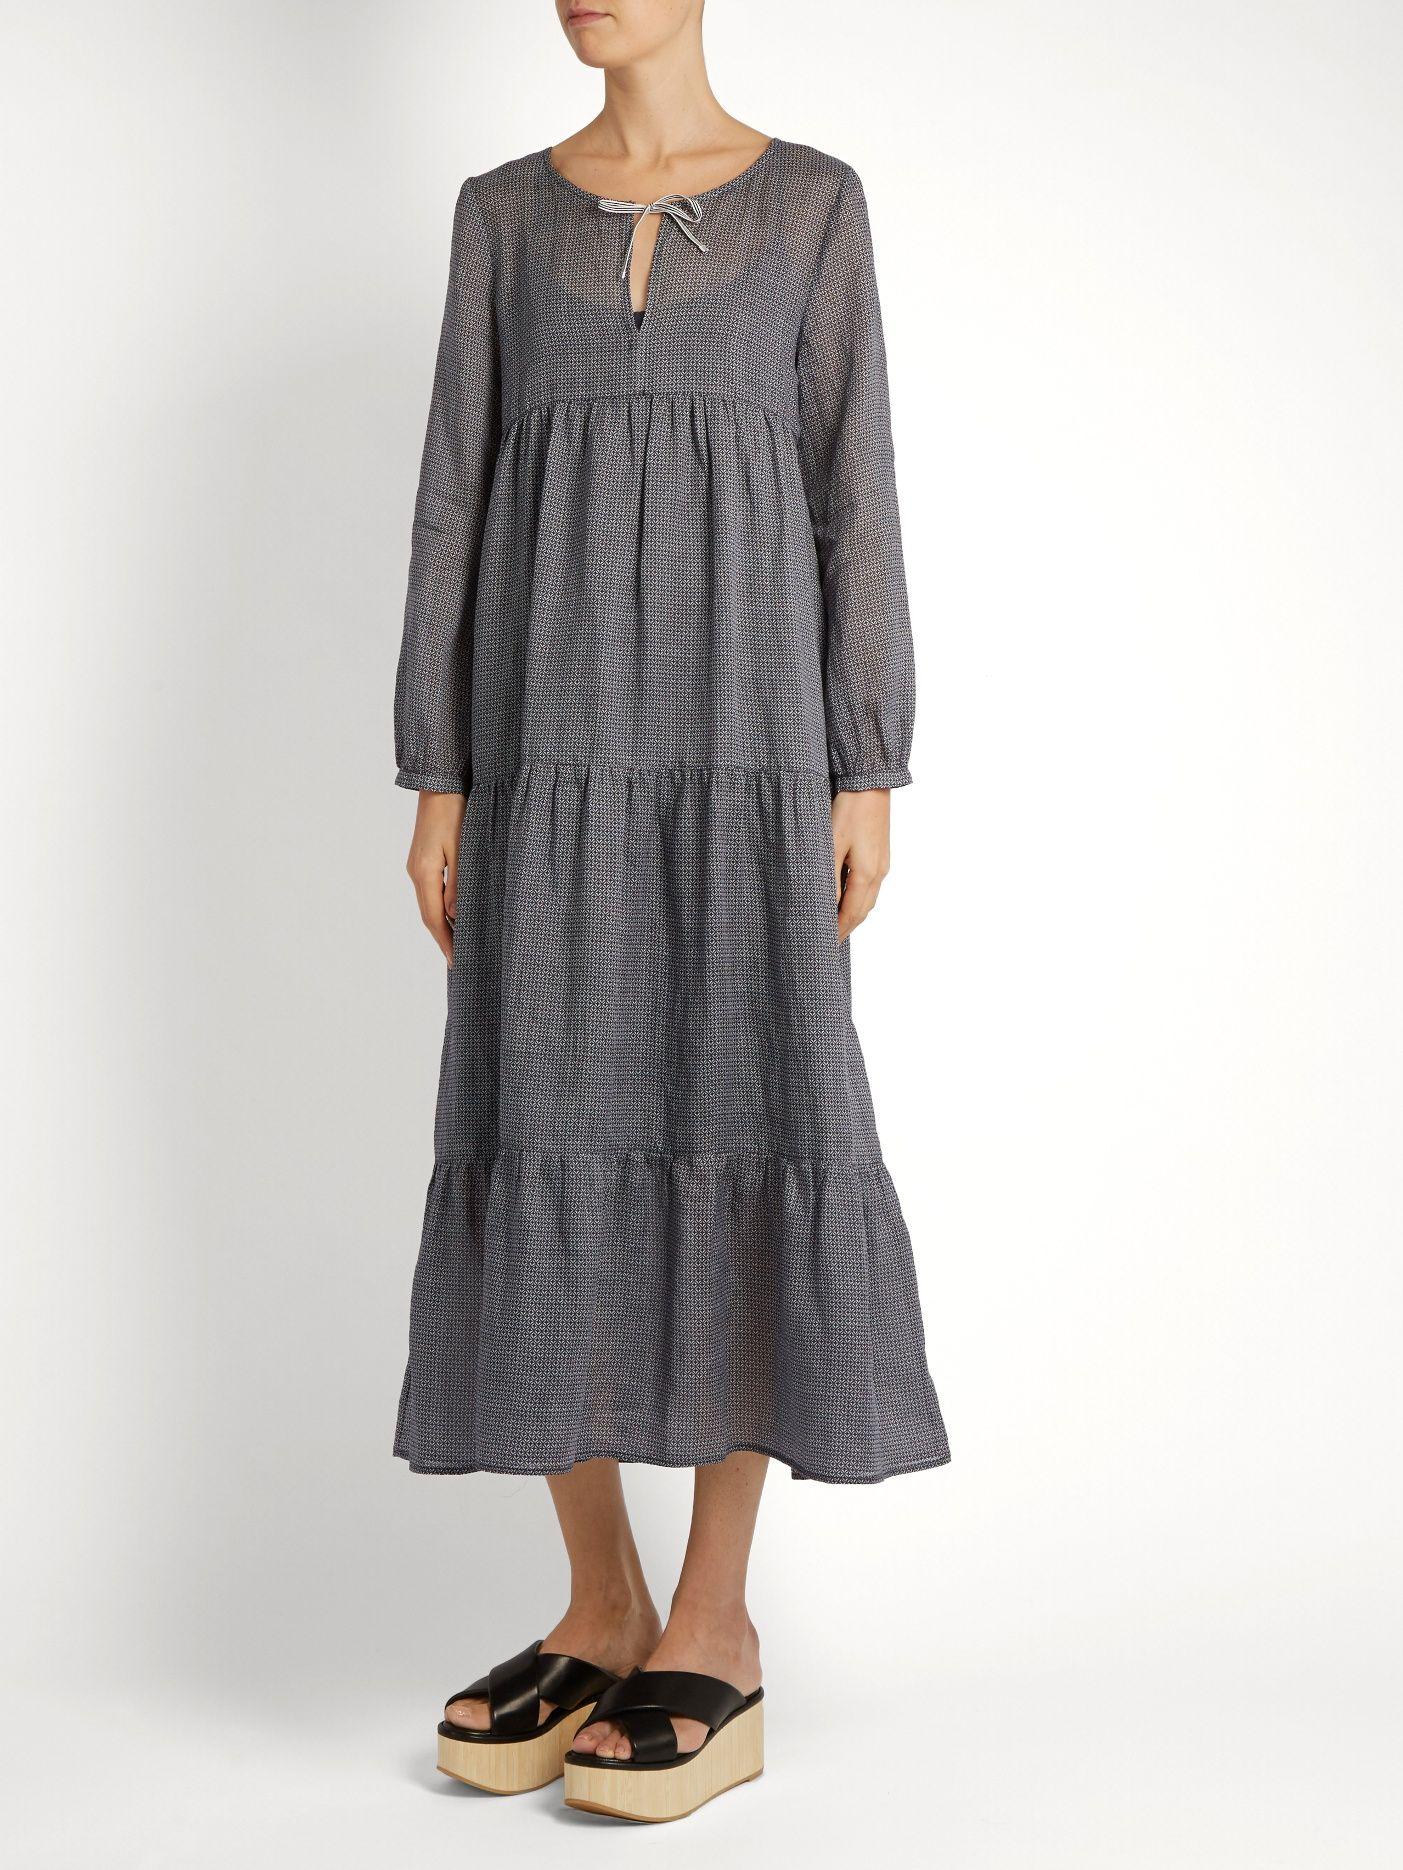 8cfa4bd2f0 Otranto dress | Weekend Max Mara | MATCHESFASHION.COM Max Mara, Women Wear,